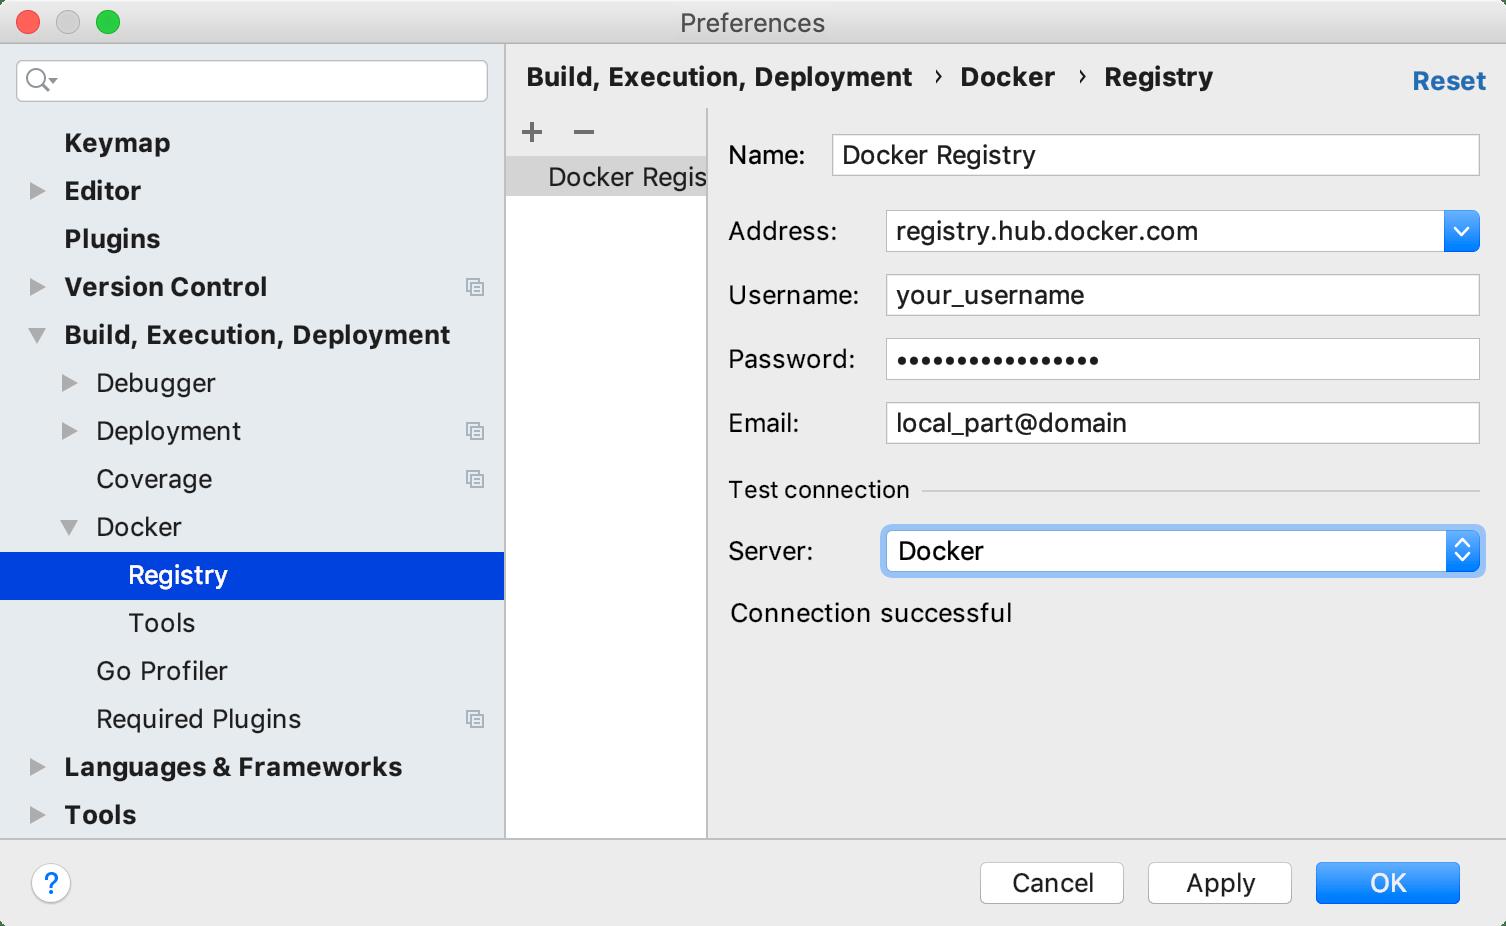 The Docker Registry dialog